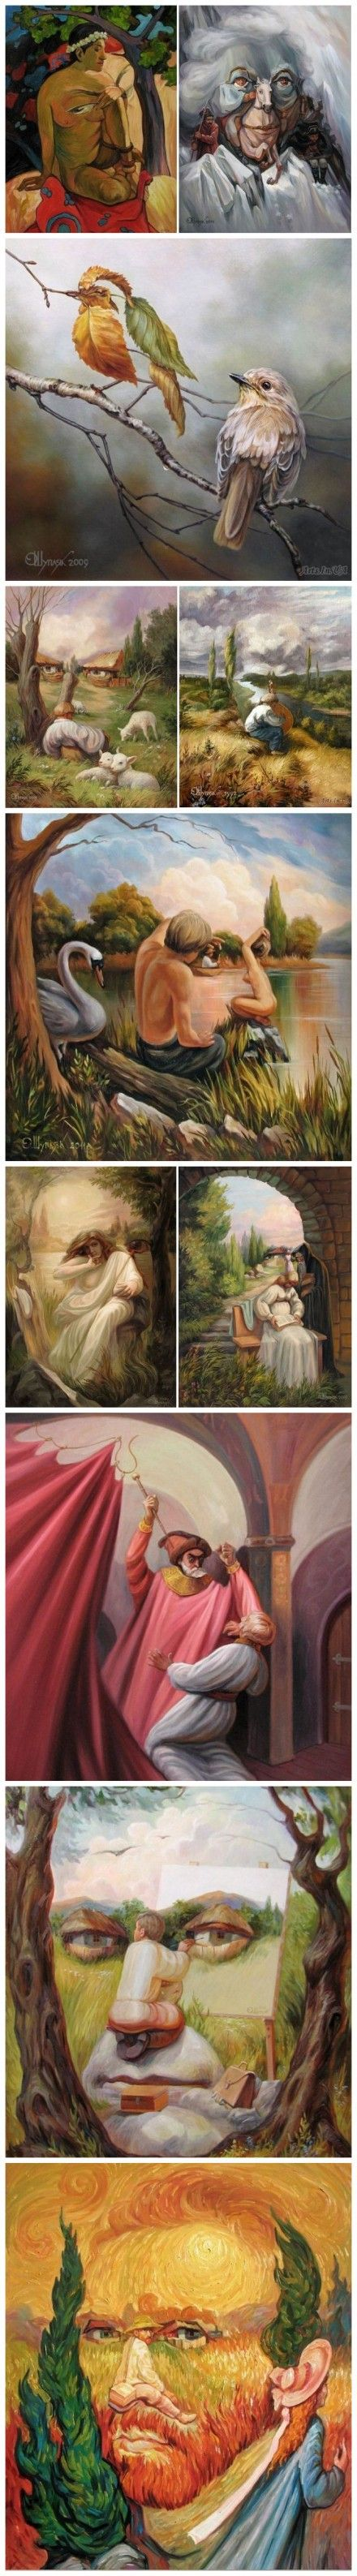 Surrealism - Art